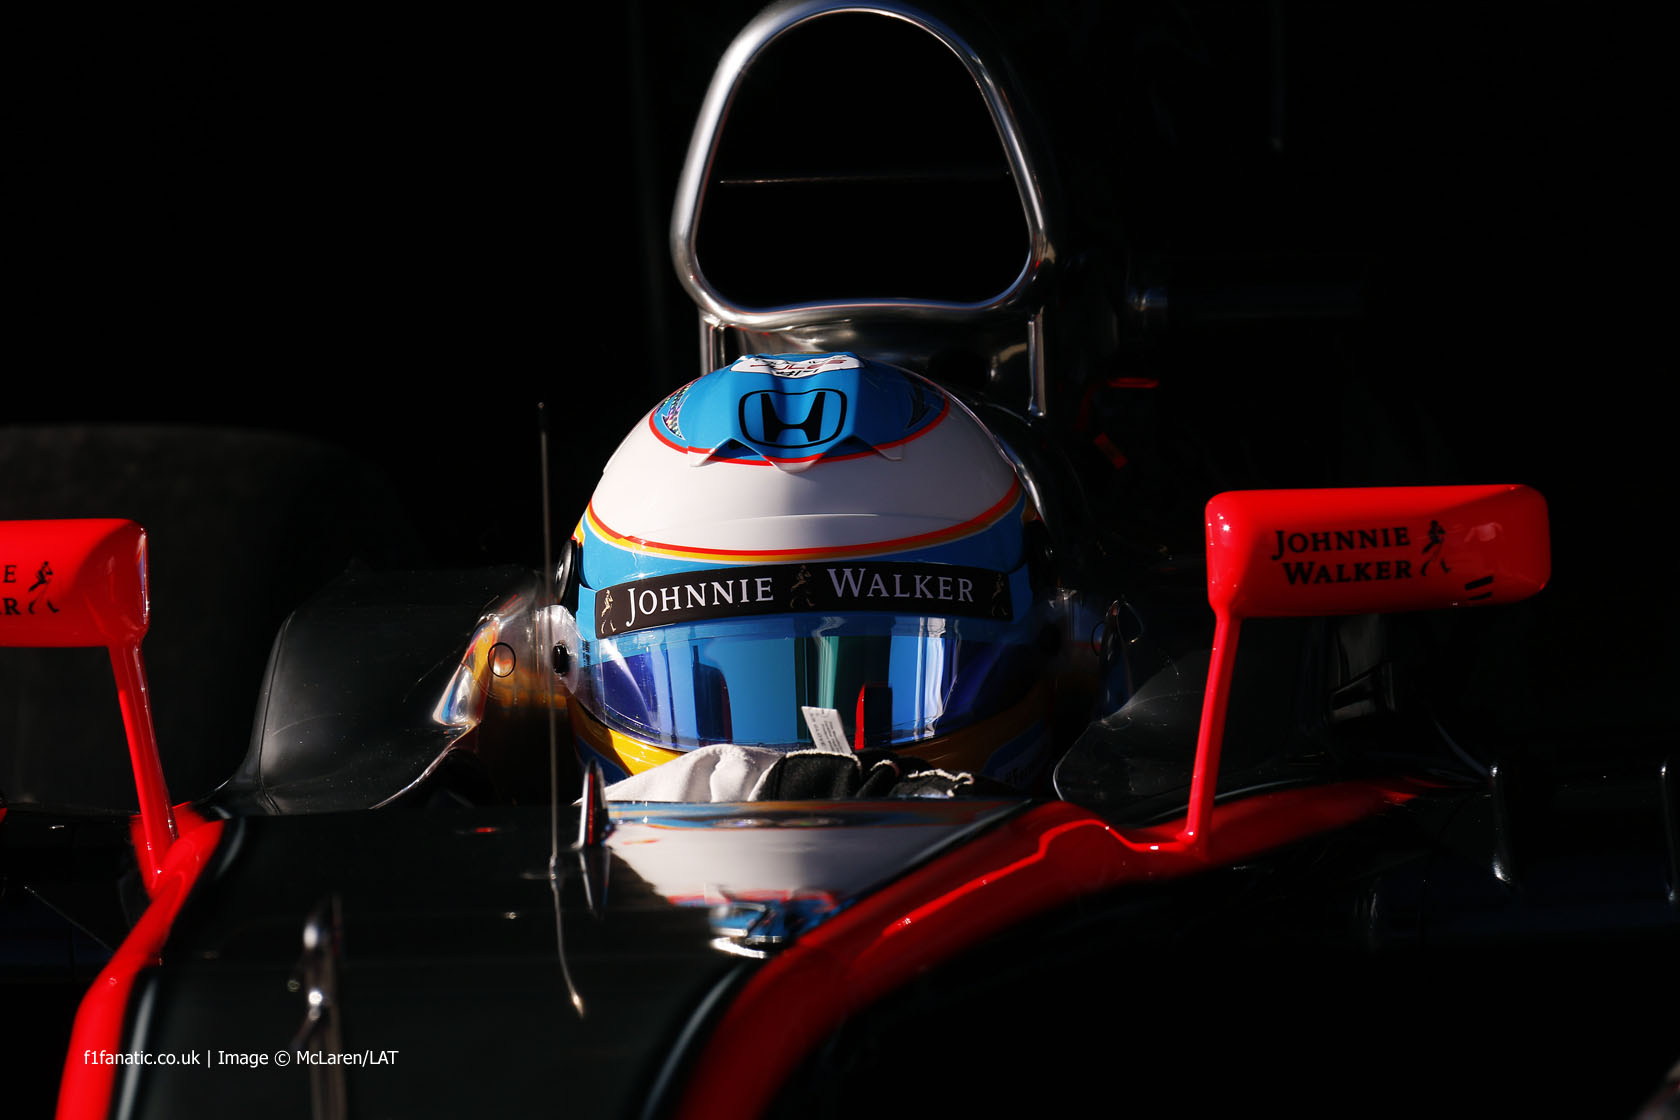 Mclaren 2015 F1 Car Wallpaper Fernando Alonso Mclaren Circuito De Jerez 2015 183 F1 Fanatic